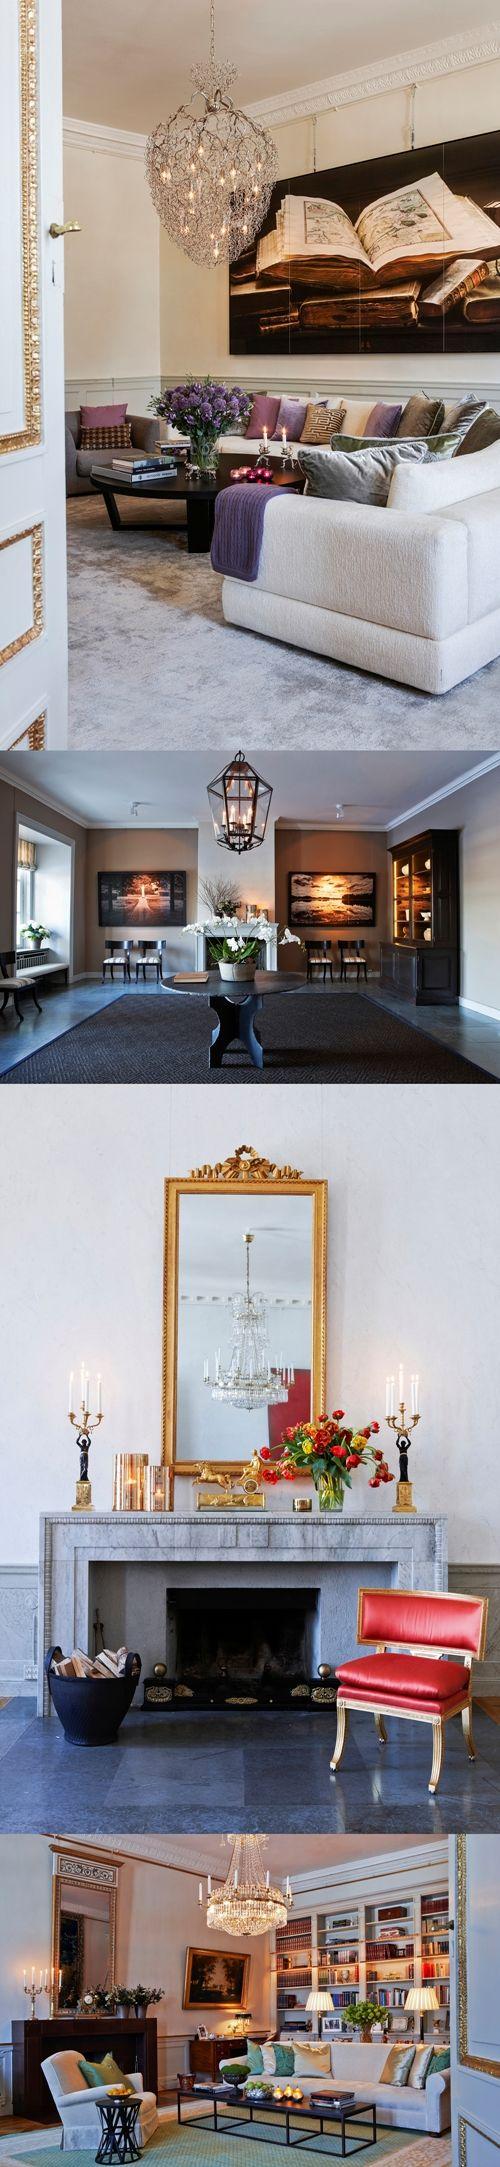 Kika in i Haga slott